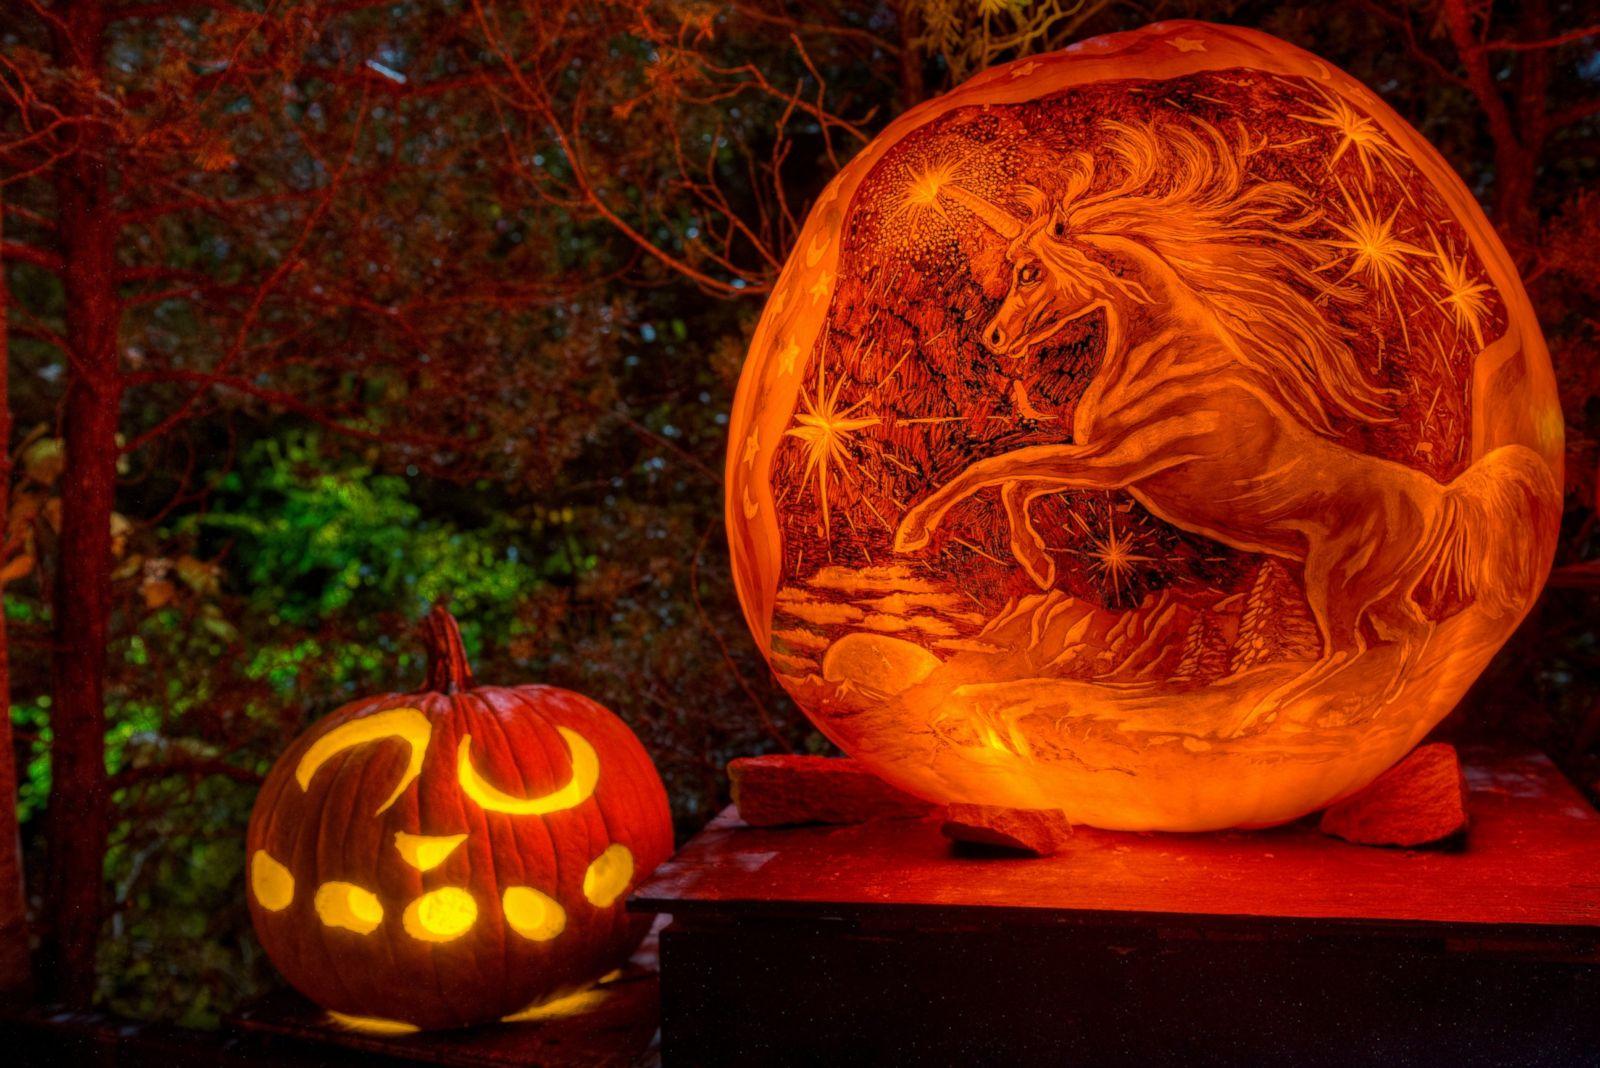 Halloween 2014 Amazing Pumpkin Carvings Photos Image 81 Abc News